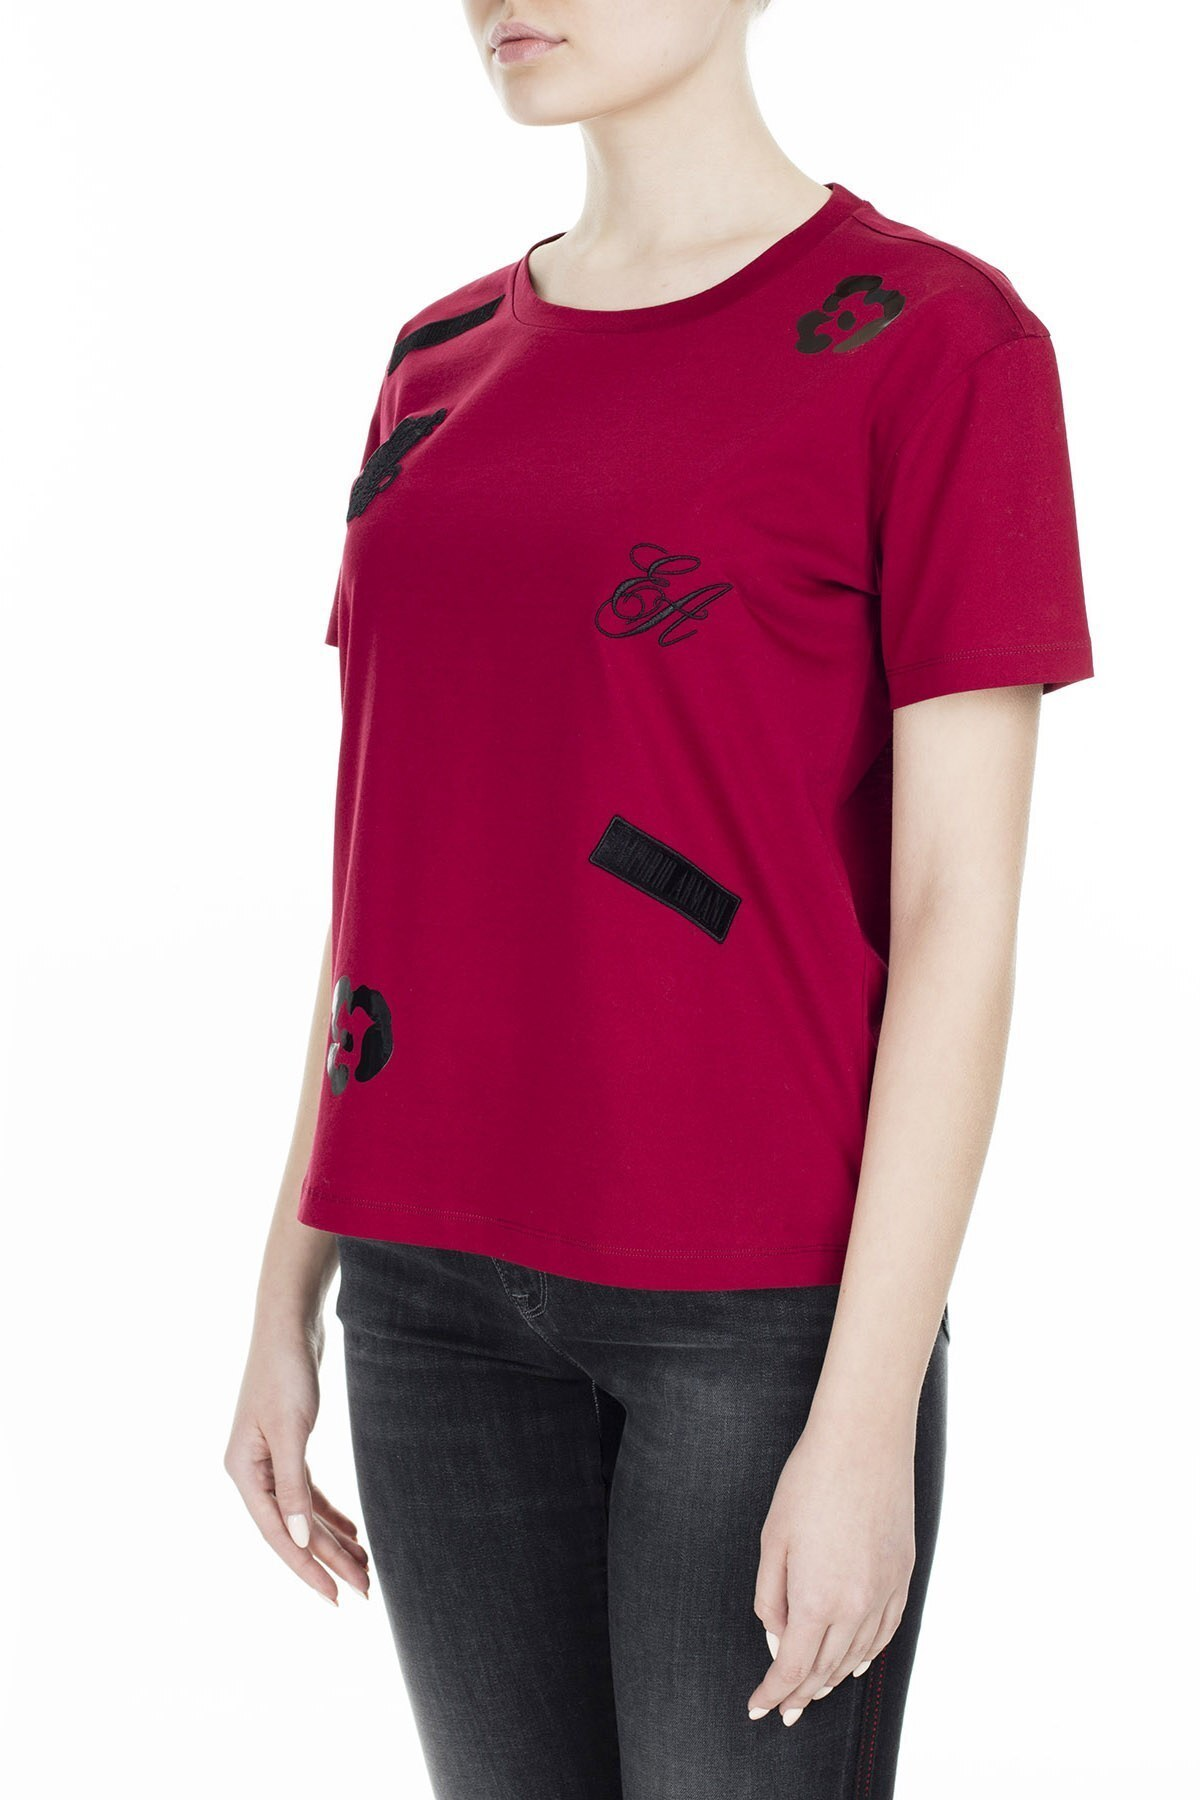 Emporio Armani Kadın T Shirt S 6G2T7M 2J95Z 0340 BORDO